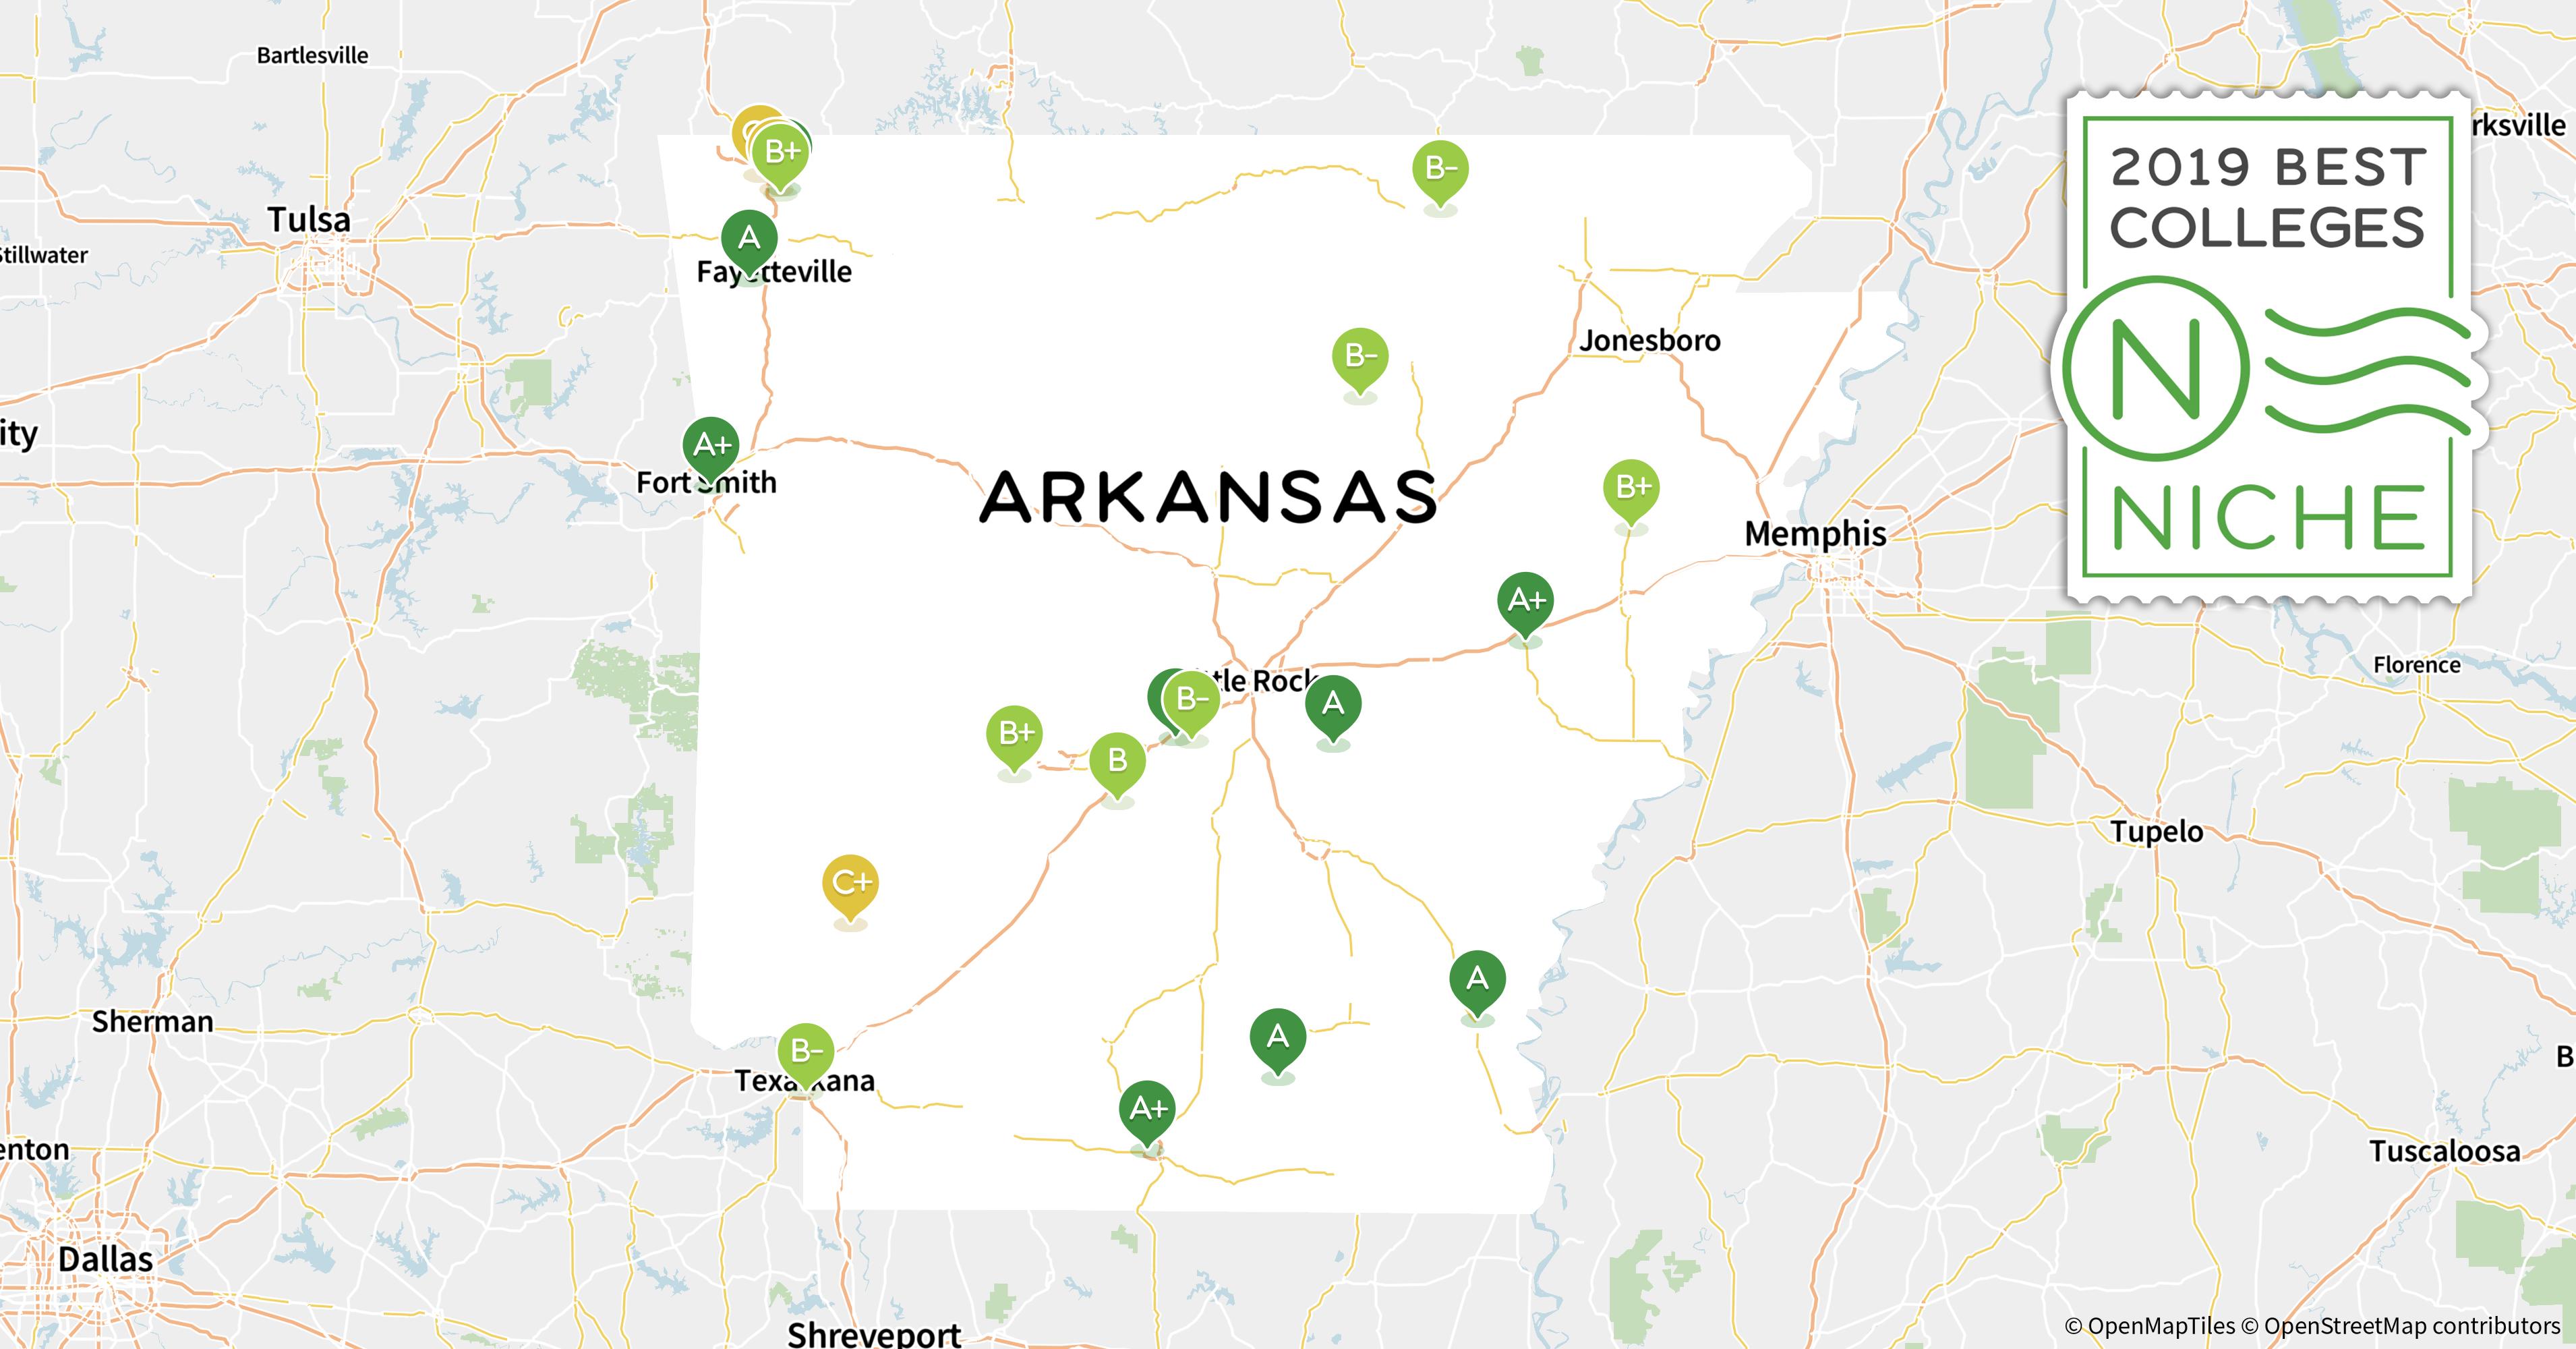 universities in arkansas map 2020 Top Graduate Programs In Arkansas Niche